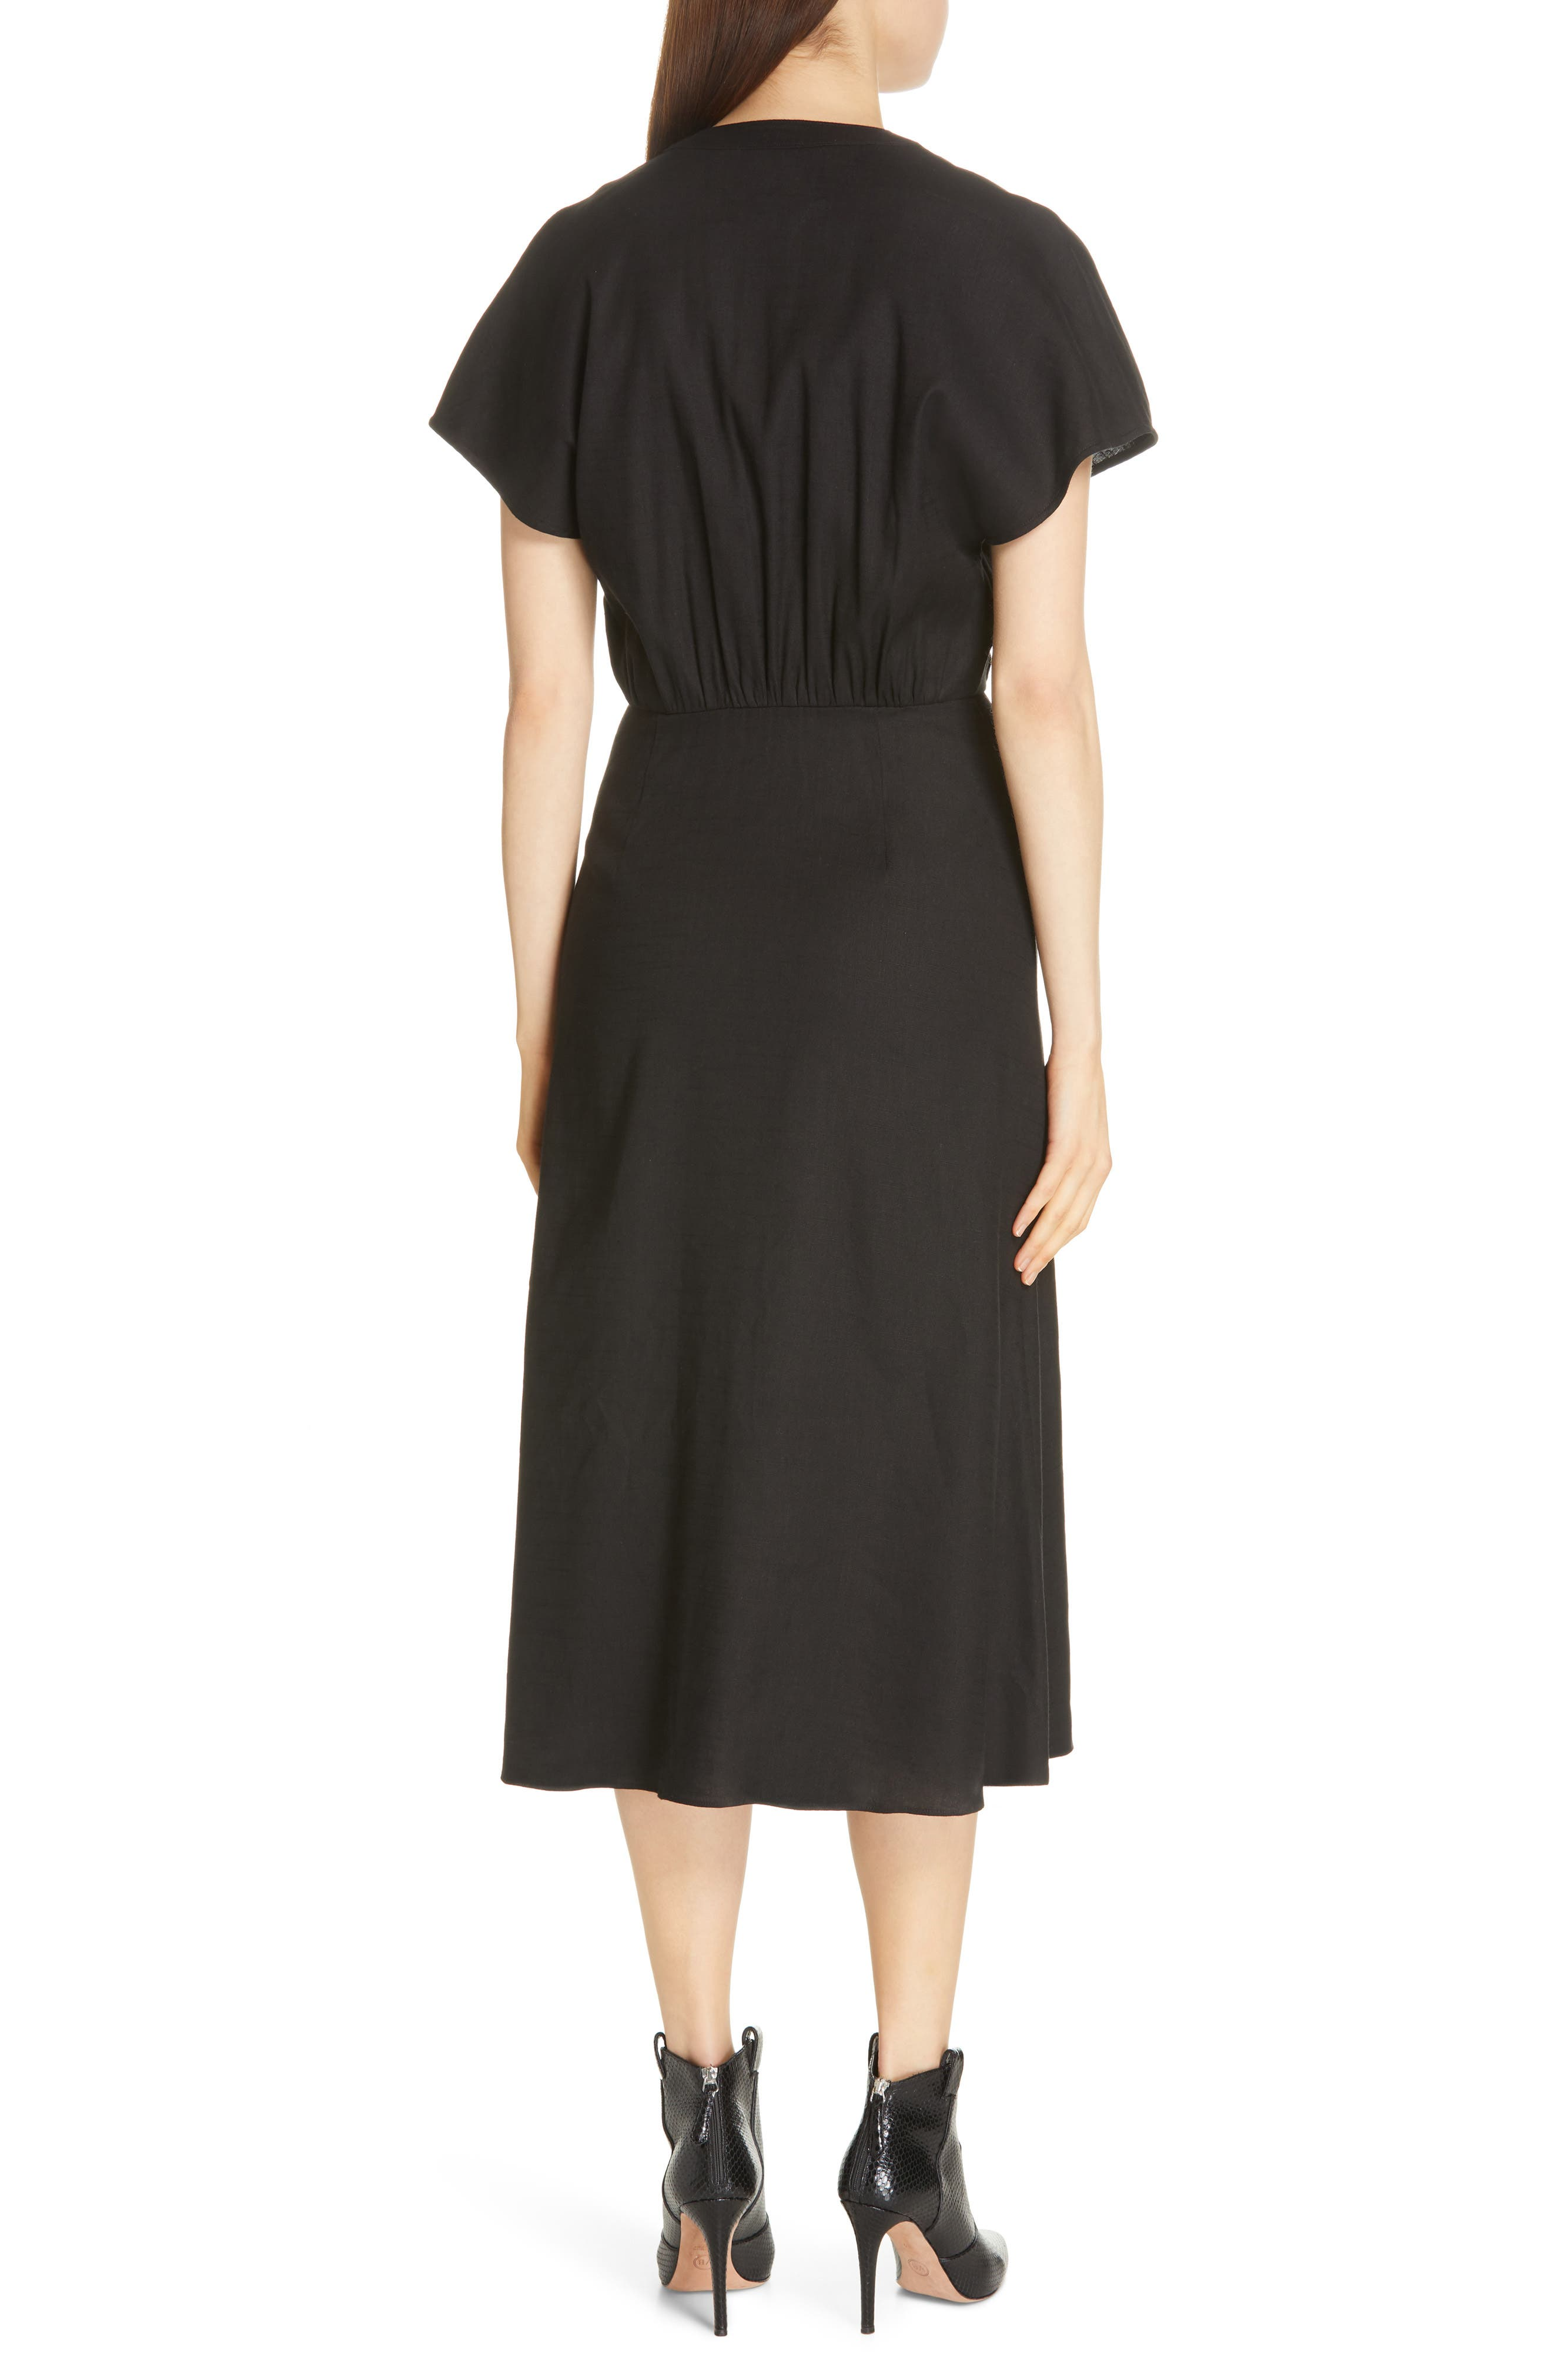 VERONICA BEARD, Giana Tie Waist Linen Blend Midi Dress, Alternate thumbnail 2, color, BLACK